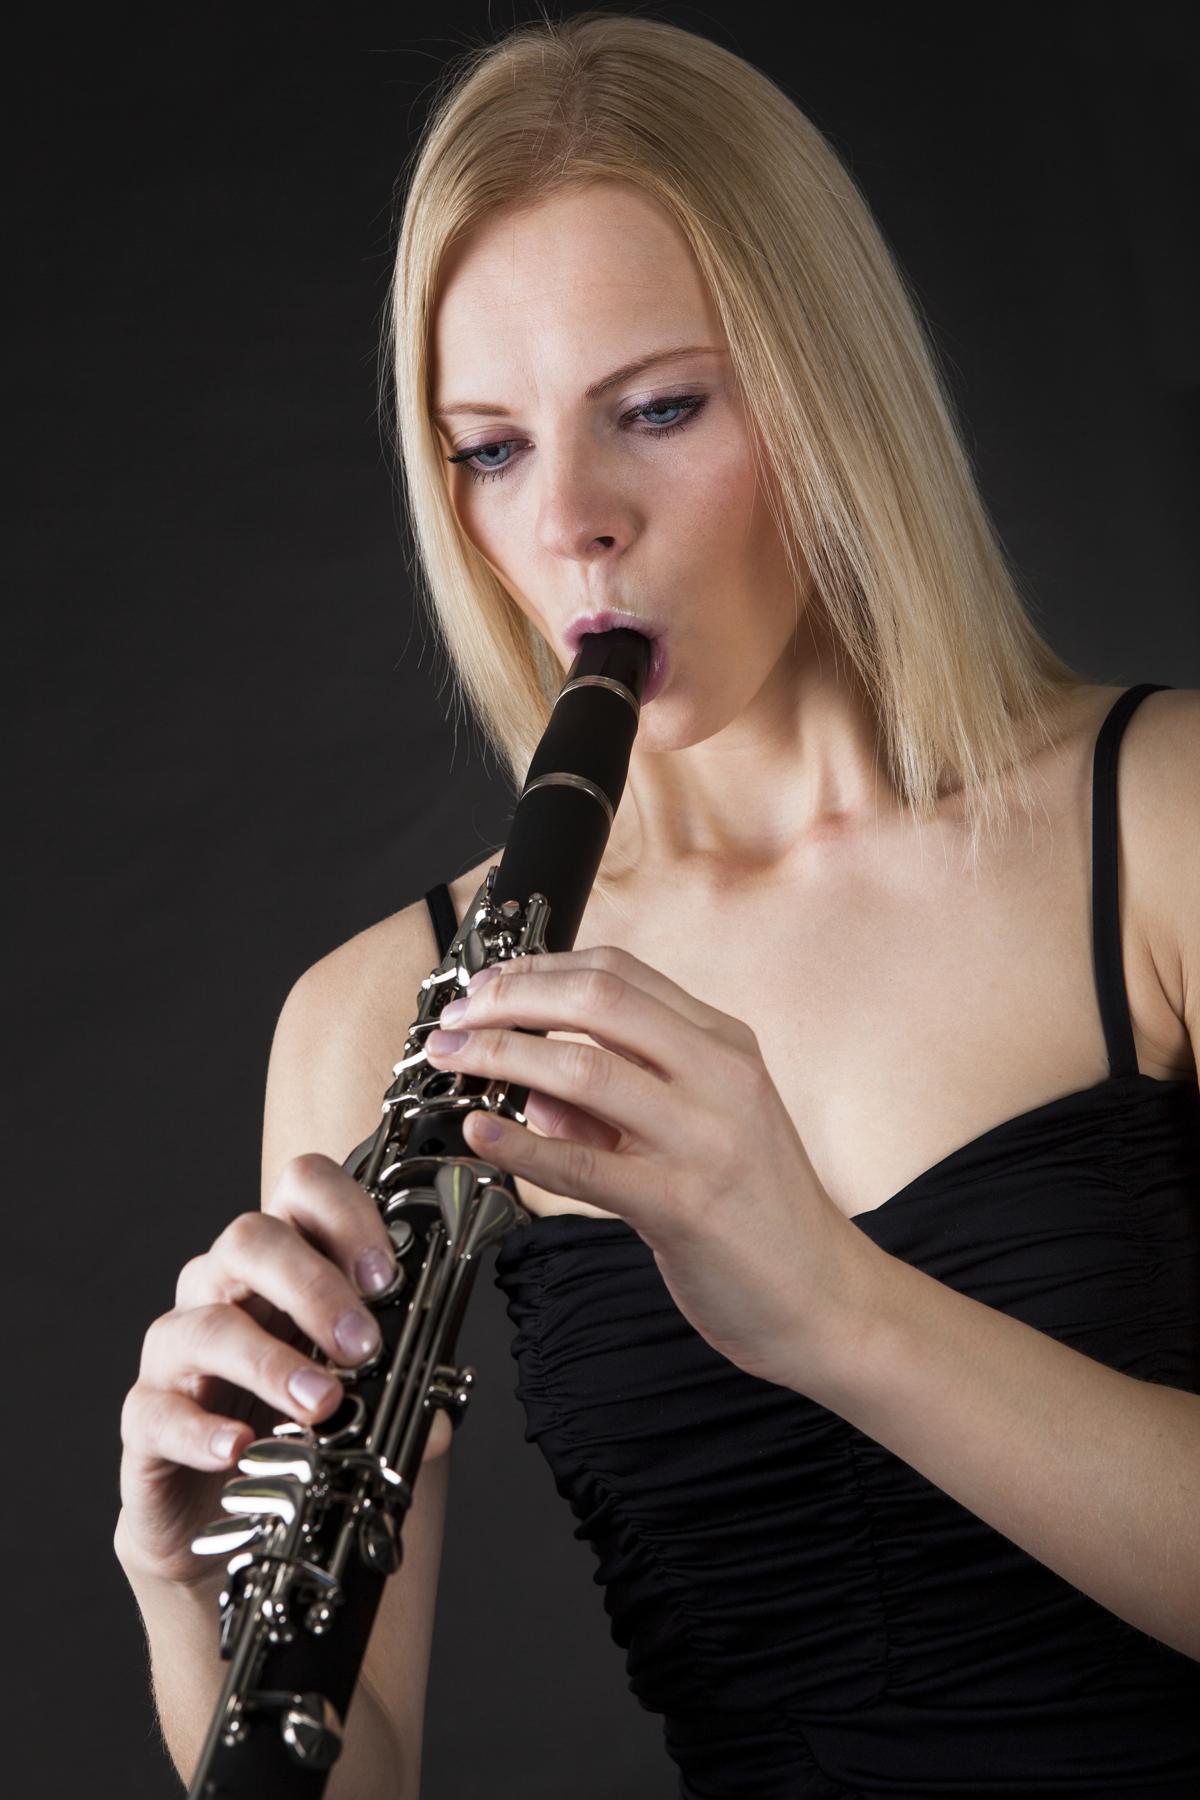 1200-25858737-woman-playing-clarinet.jpg